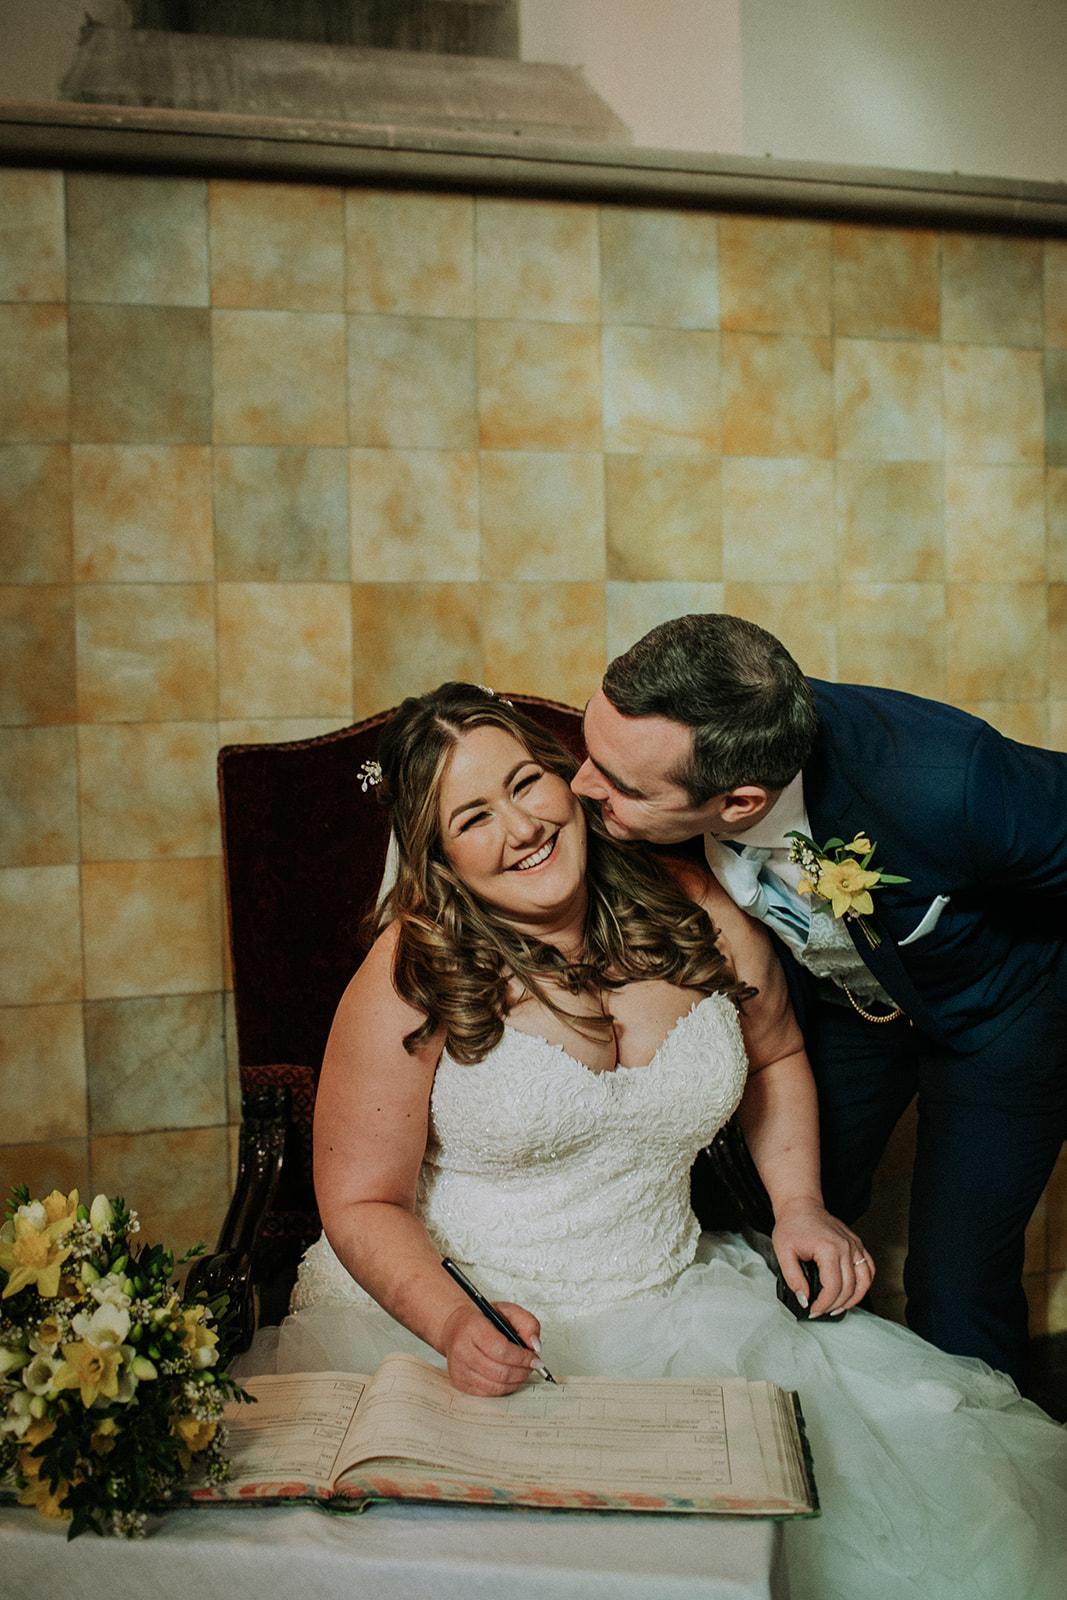 rutland wedding - fun wedding - east midlands wedding planner - Leicestershire wedding planning - nottingham wedding planning - bride and groom signing documents